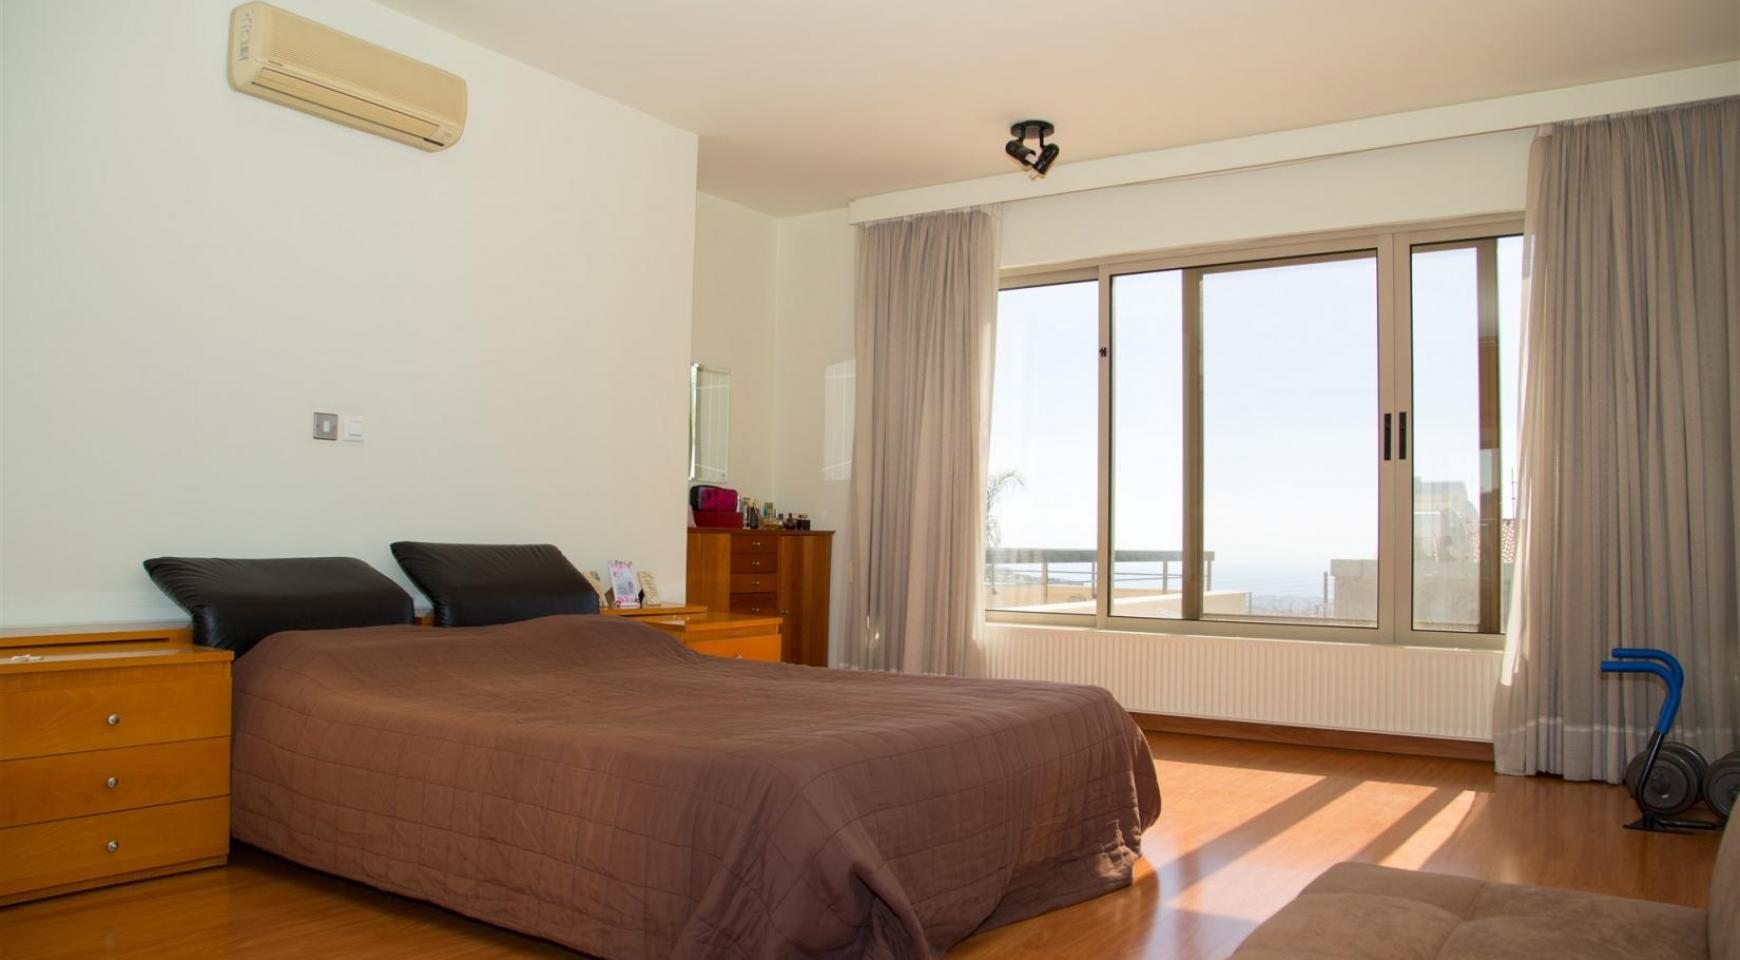 Modern Luxury 4 Bedroom Villa in Sfalagiotisa, Agios Athanasios - 31